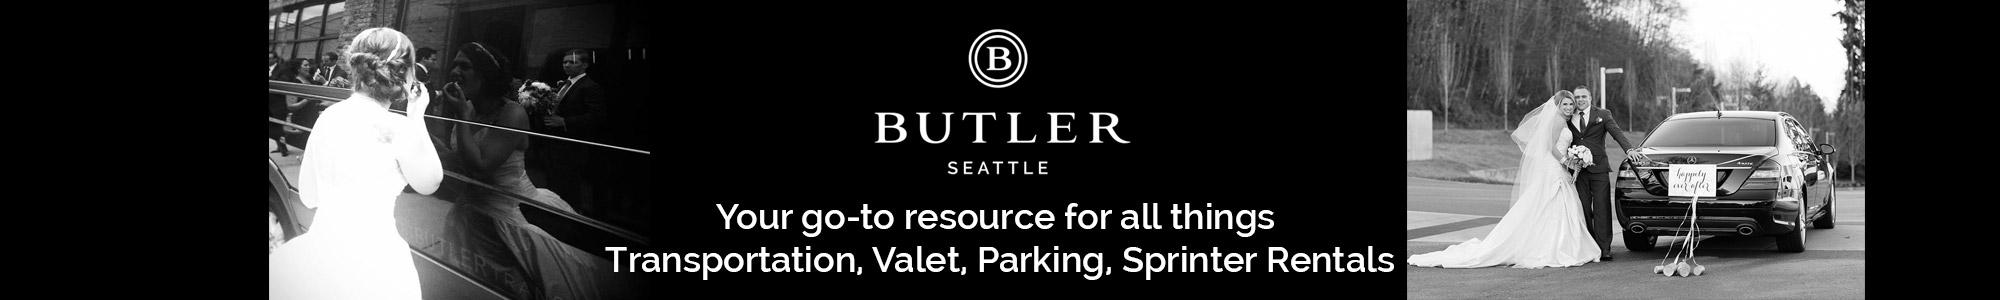 Butler_18W_BannerAd-DummyTest.jpg